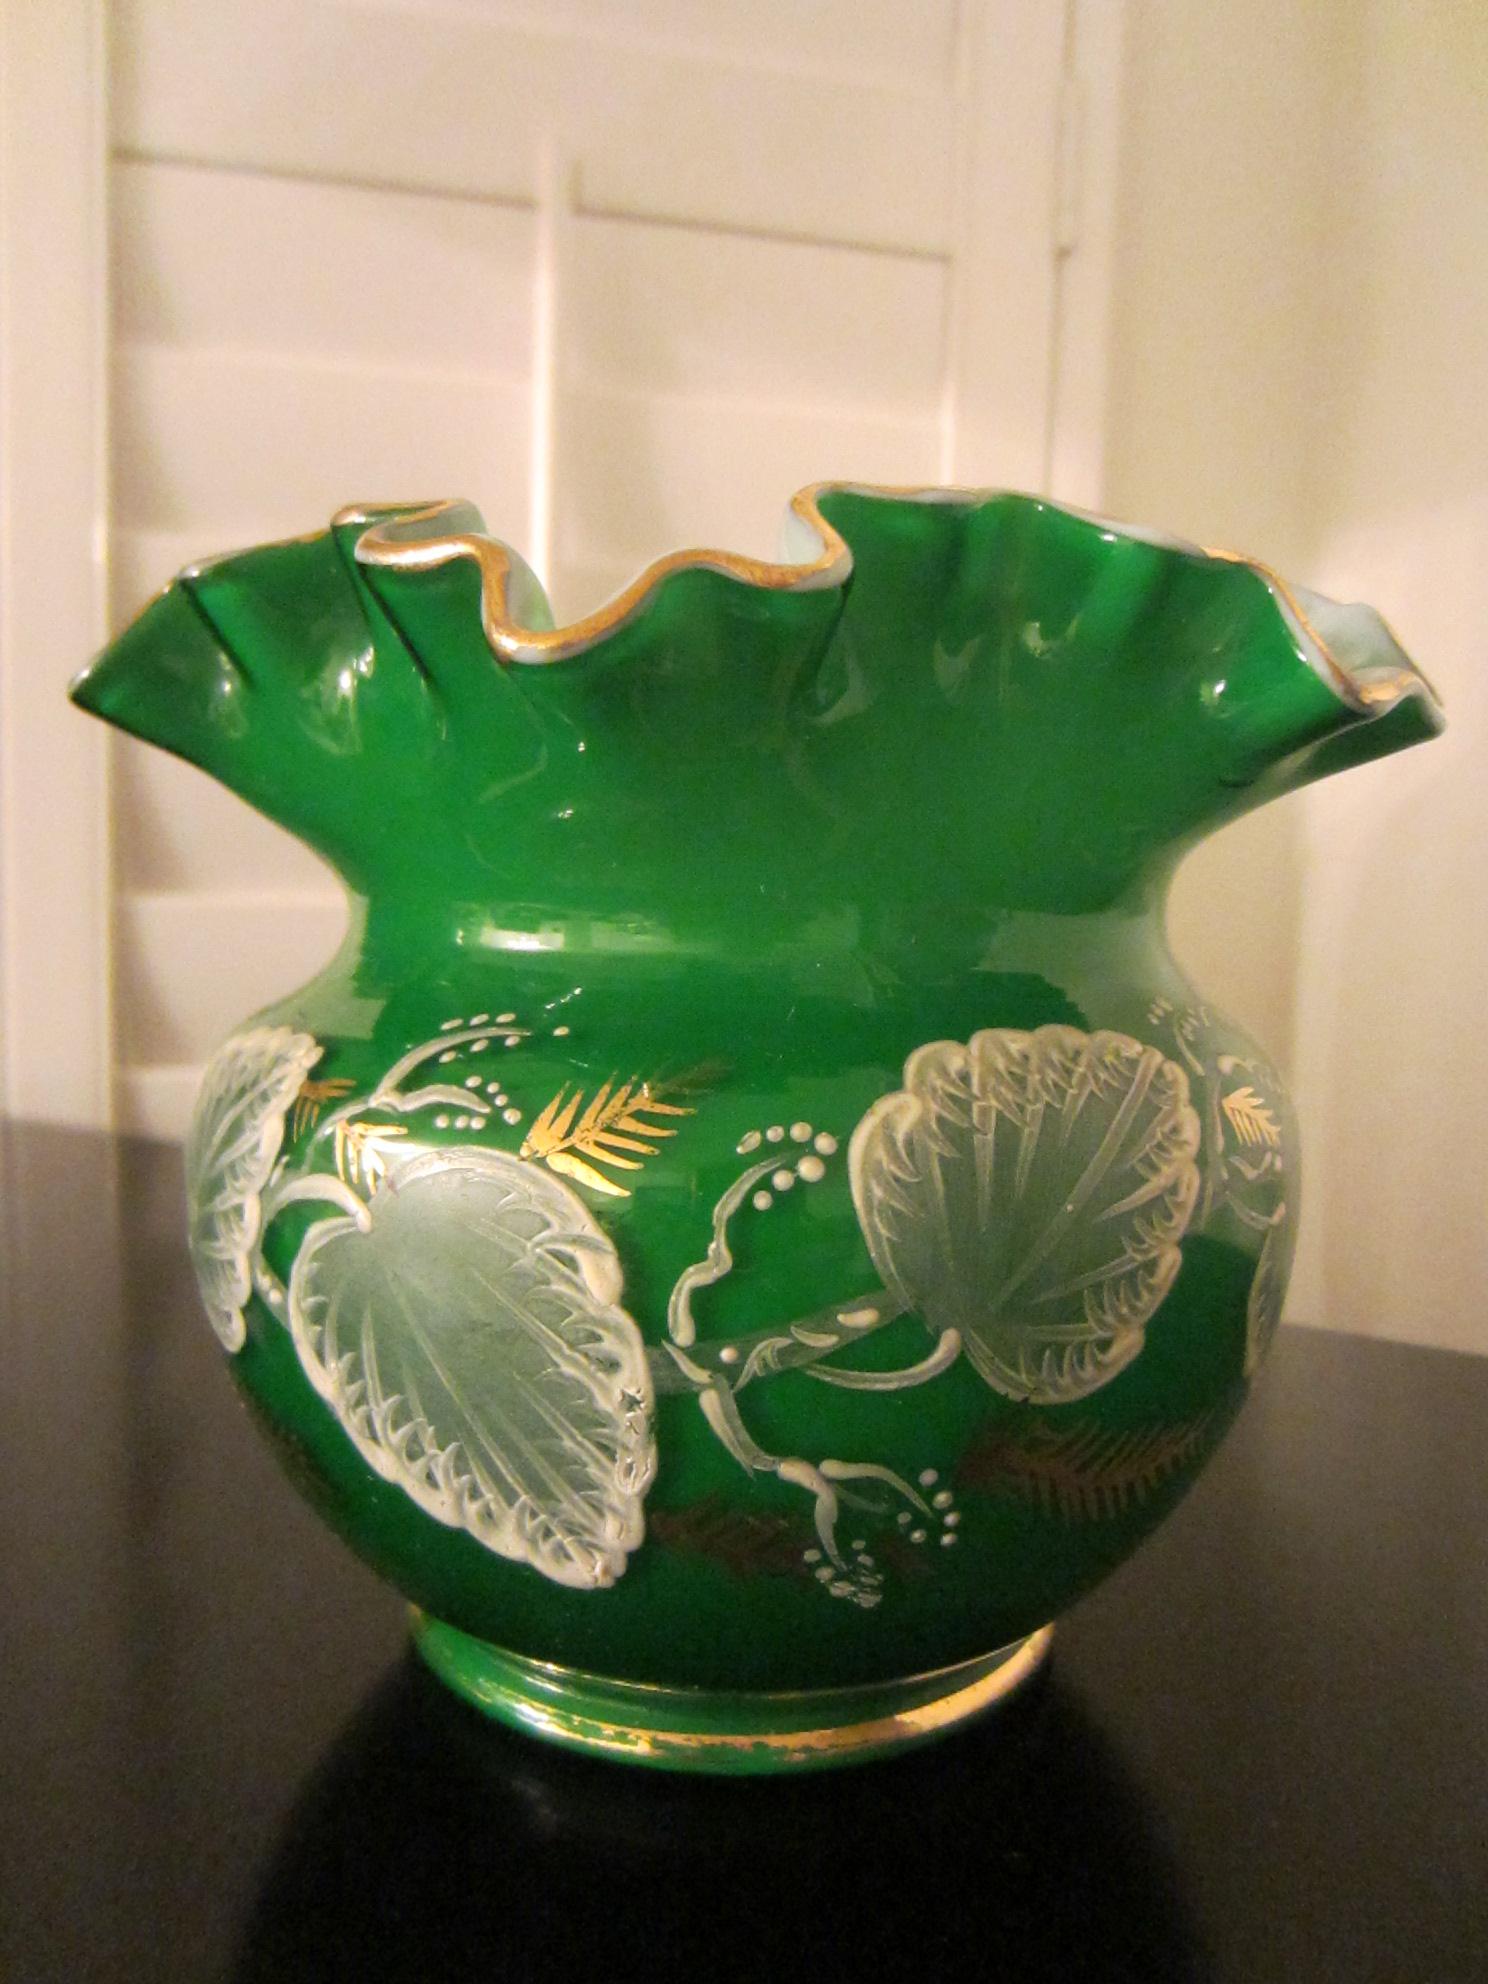 Charleton hand decorated green ruffle glass vase for sale charleton hand decorated green ruffle glass vase for sale reviewsmspy